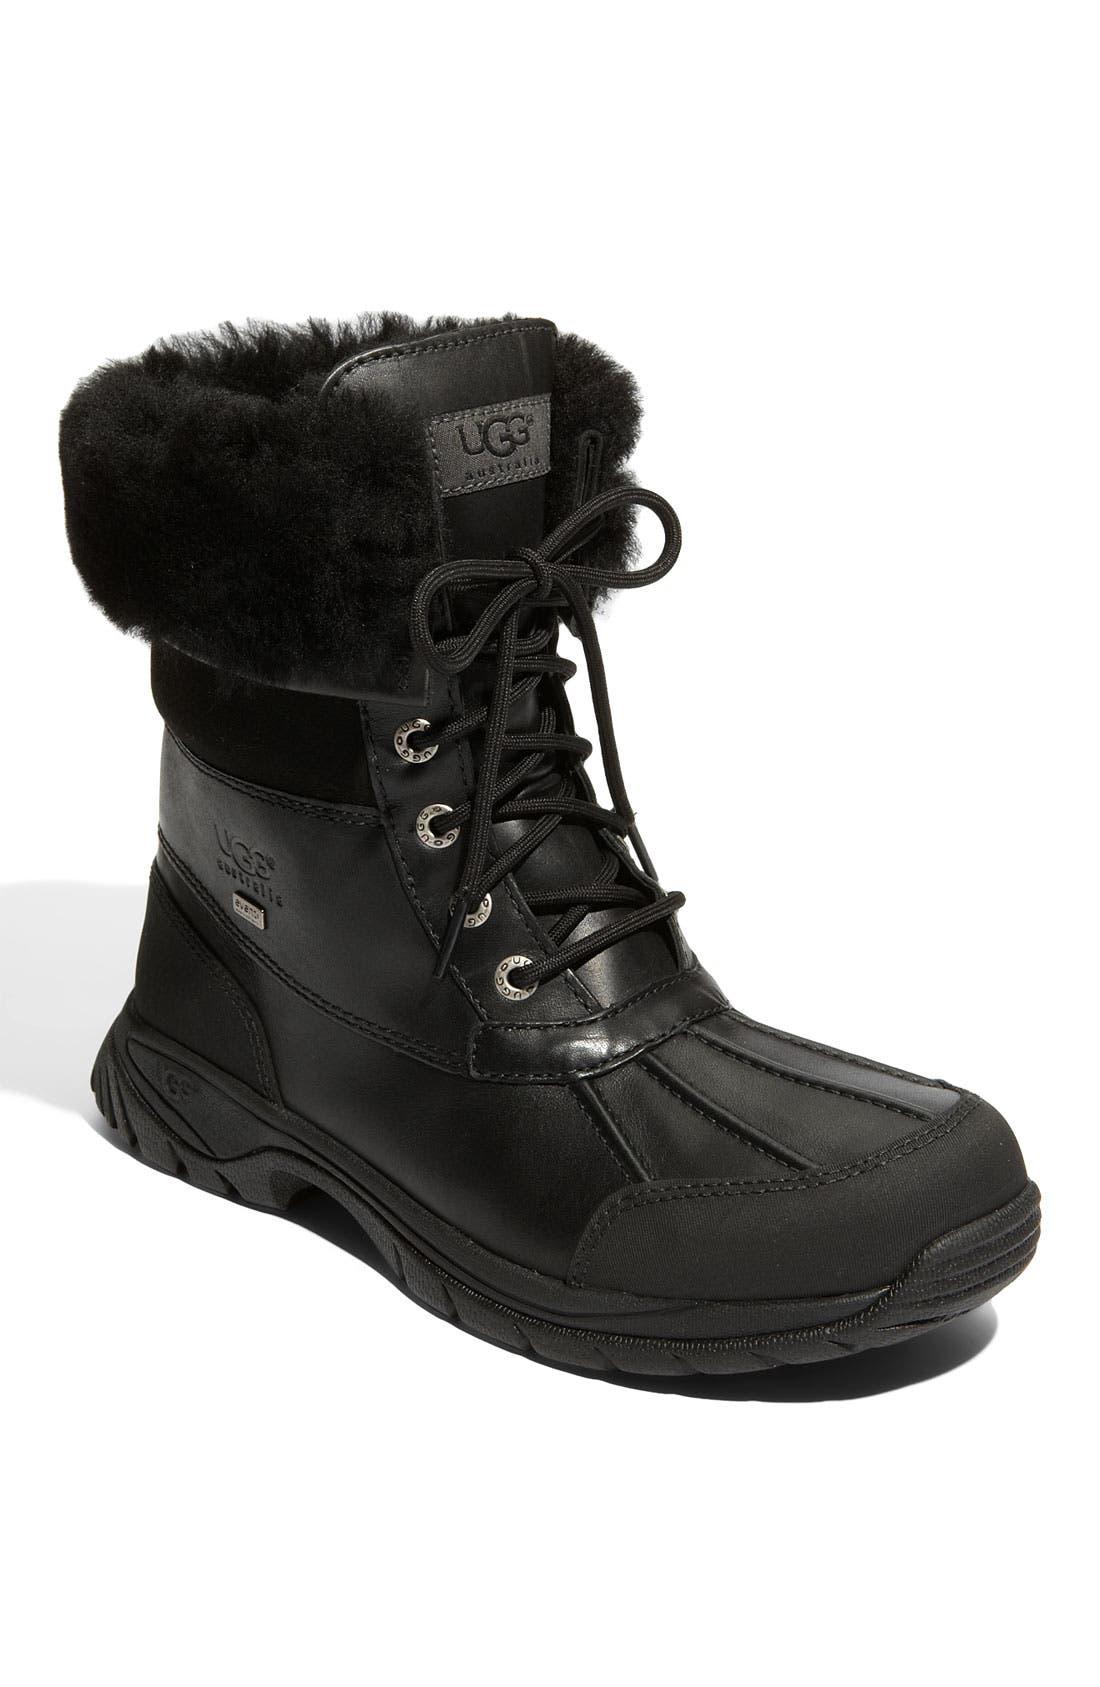 Ugg Butte Waterproof Boot, Black